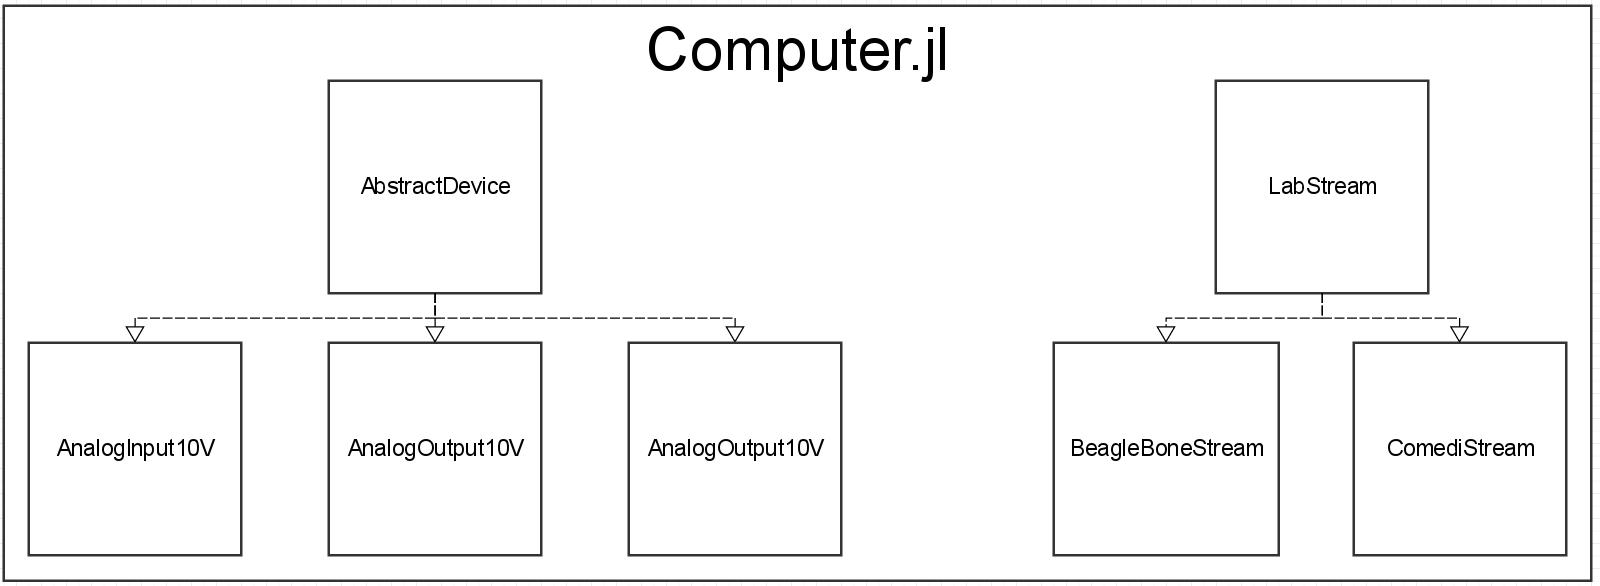 docs/images/computertypes.png